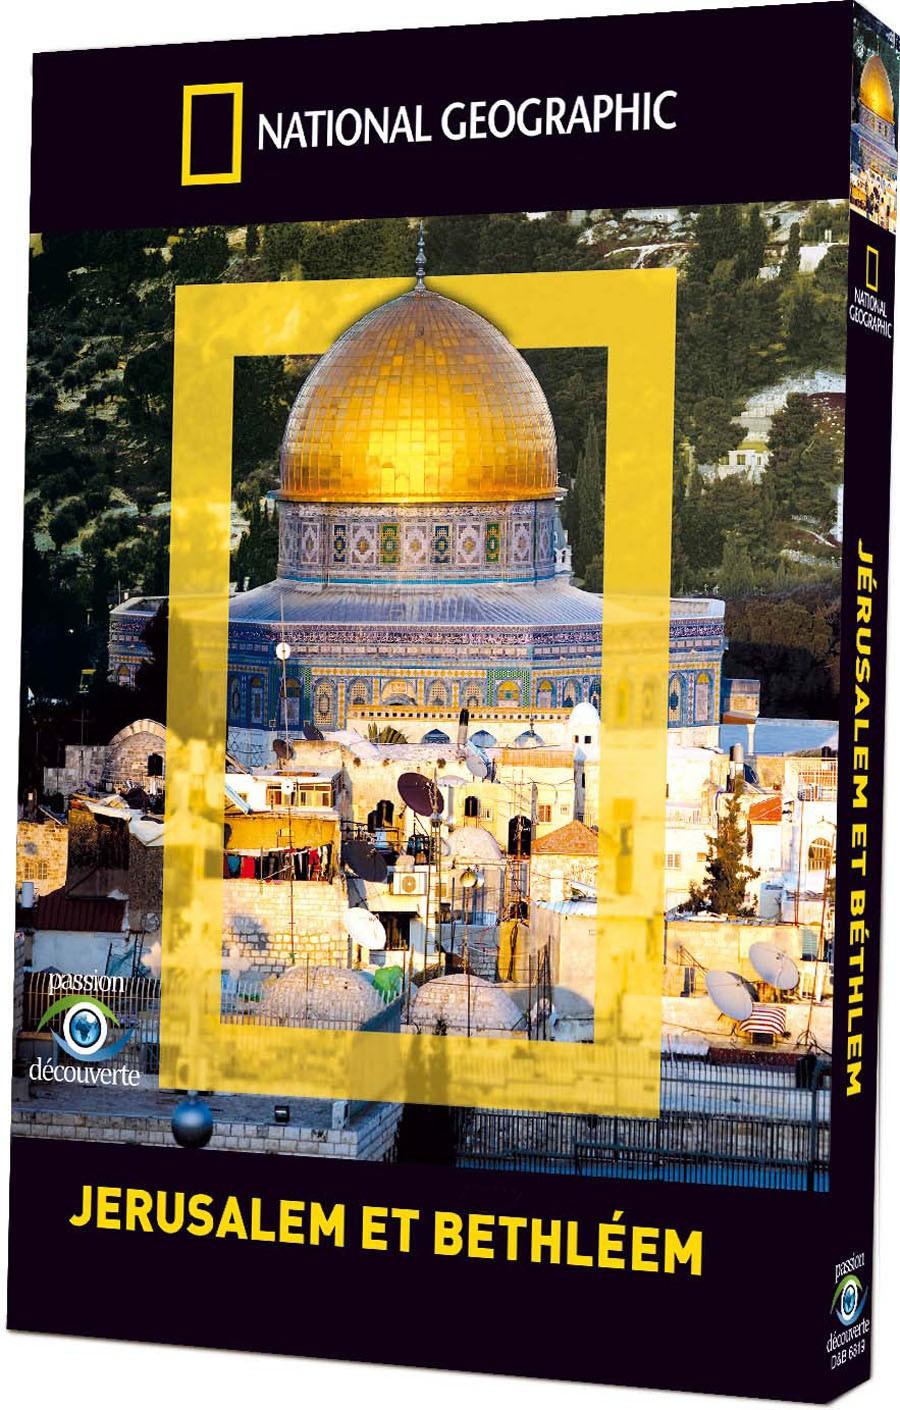 NATIONAL GEOGRAPHIC - JERUSALEM ET BETHLEEM